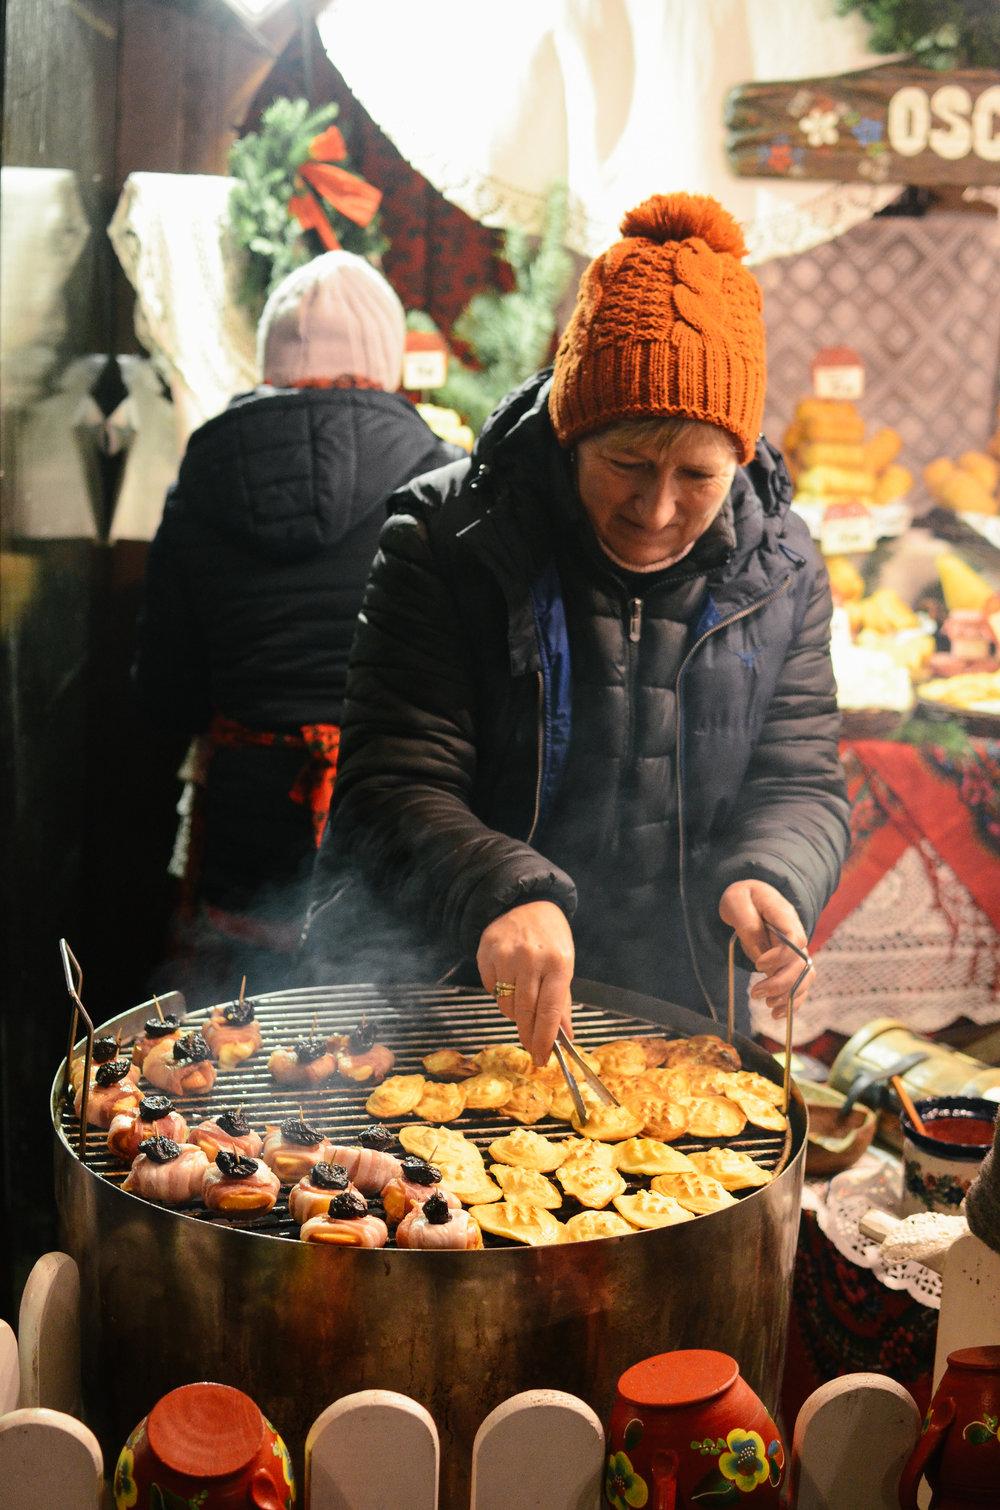 european-christmas-market-travel-guide-lifeonpine_DSC_1317.jpg